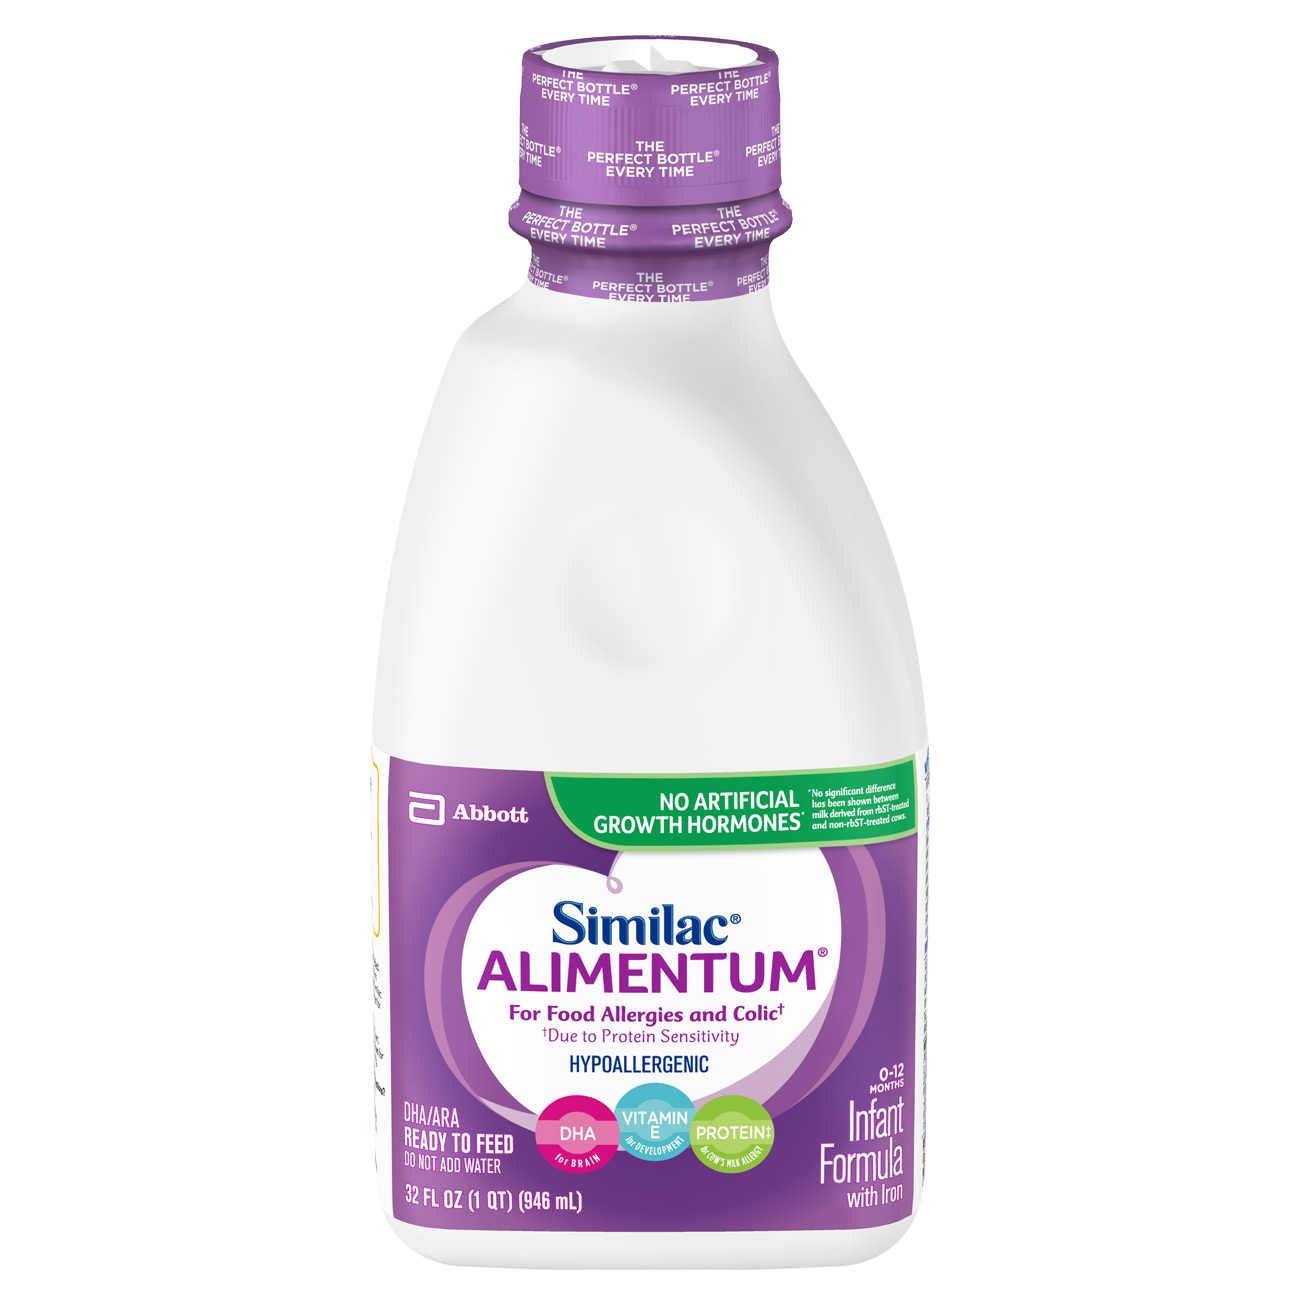 Similac Alimentum Hypoallergenic Infant Formula for Food Allergies ...